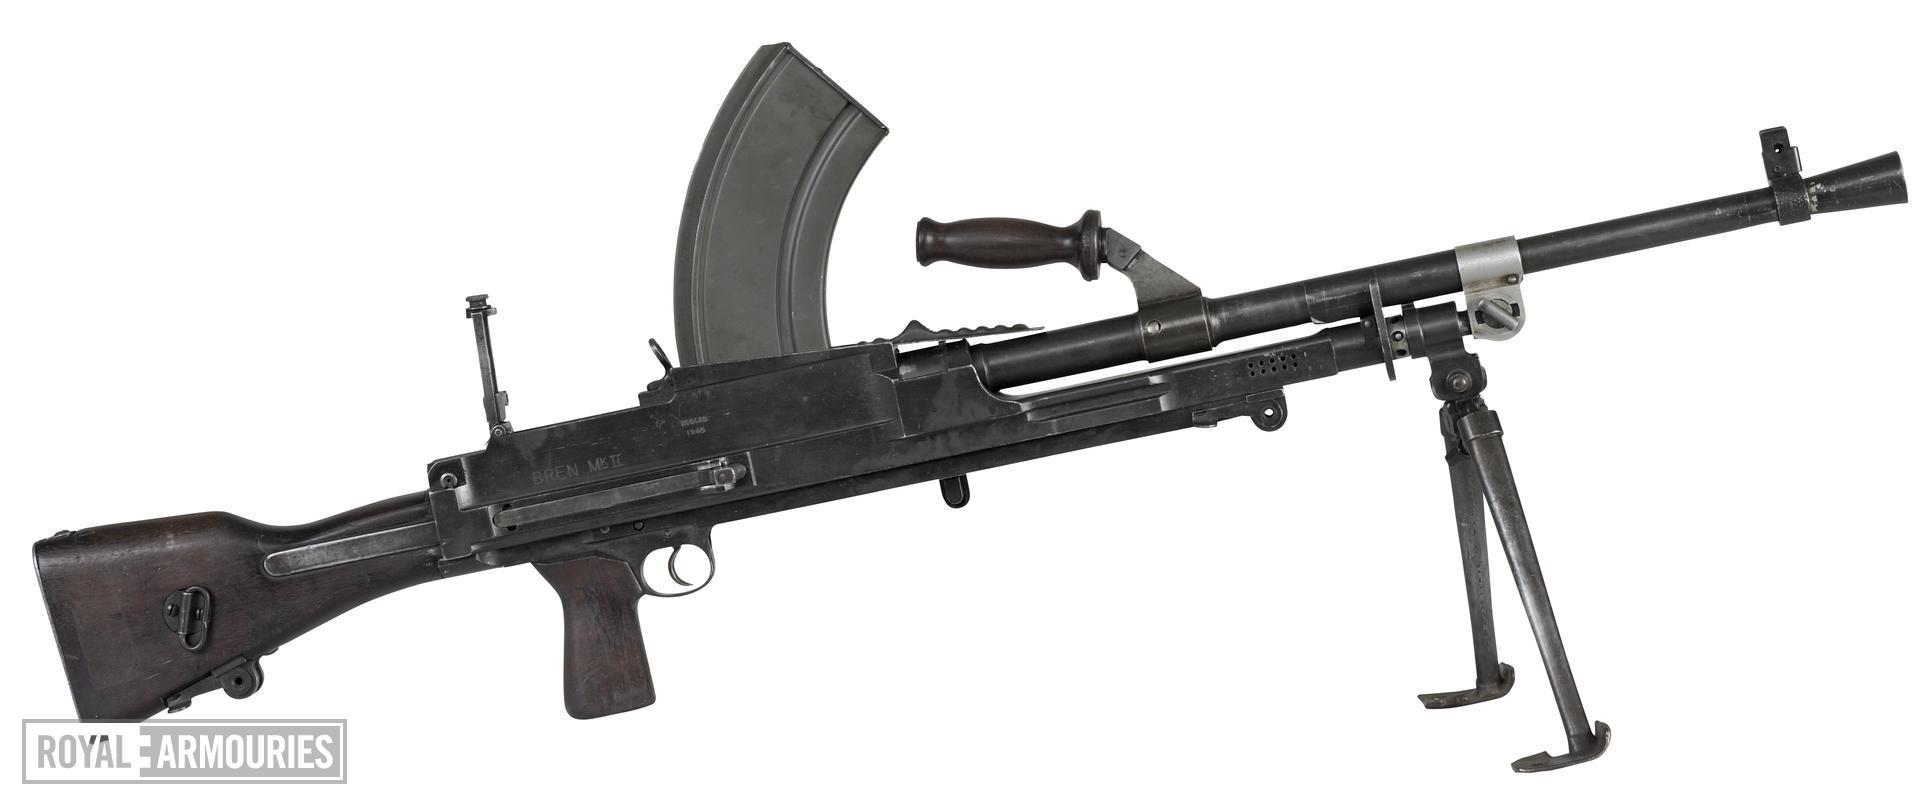 Centrefire automatic machine gun - Bren Mk.II